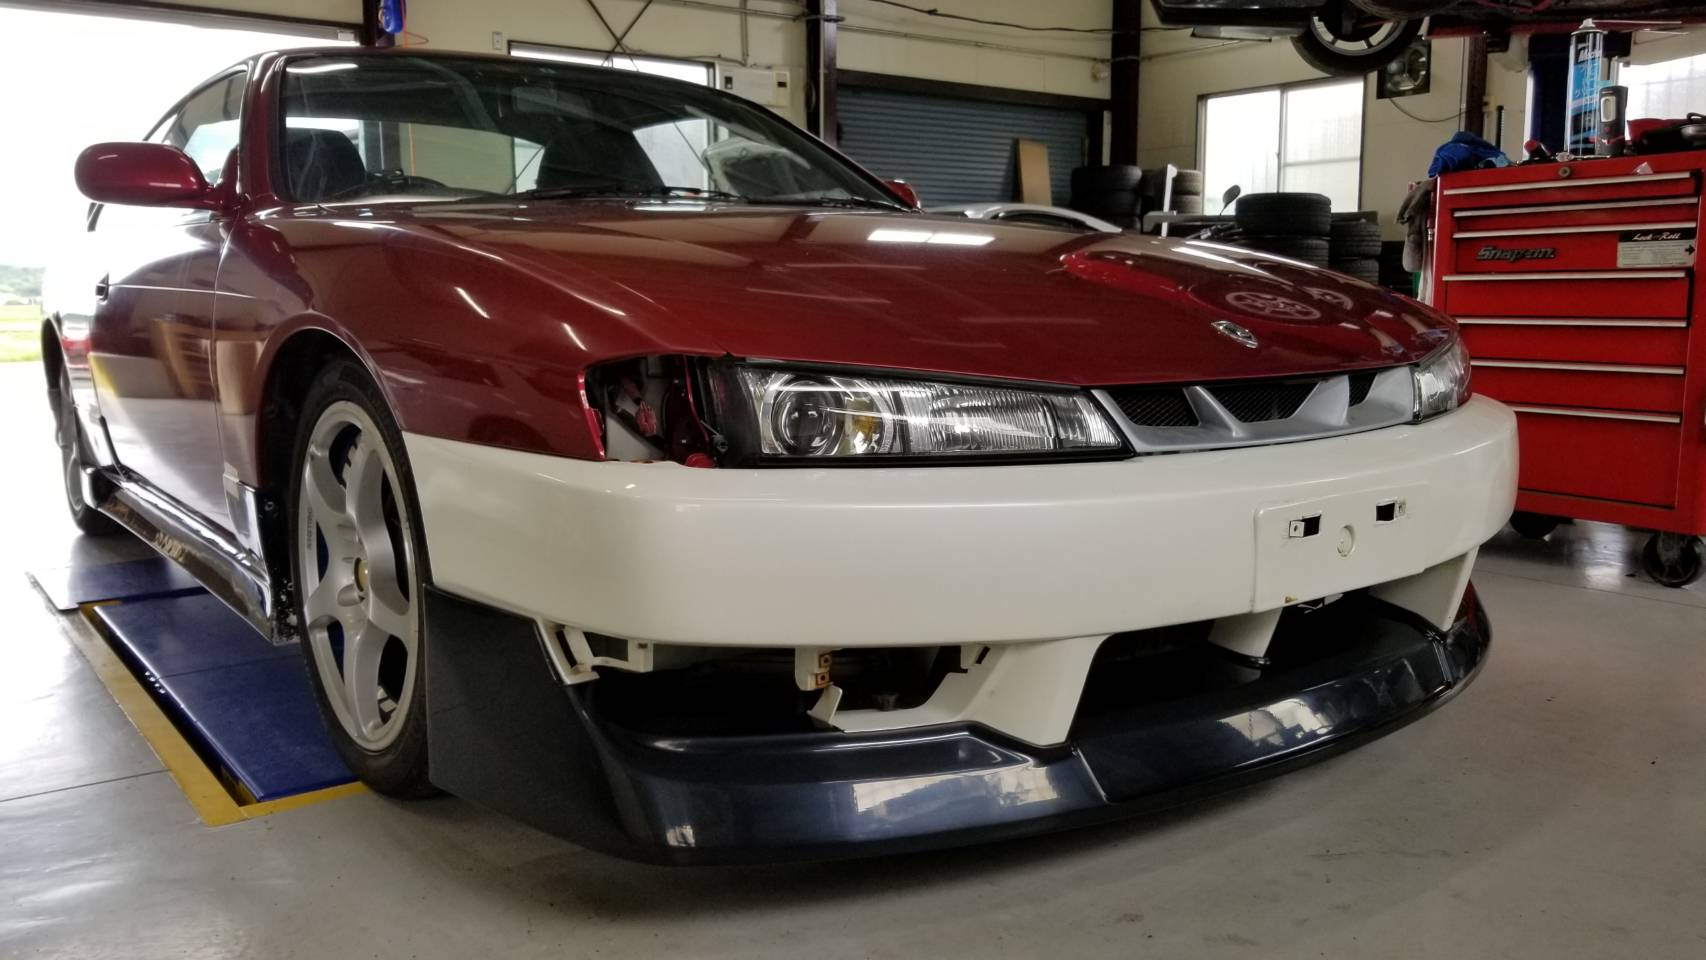 S14 シルビア | 自動車工房丸田小屋